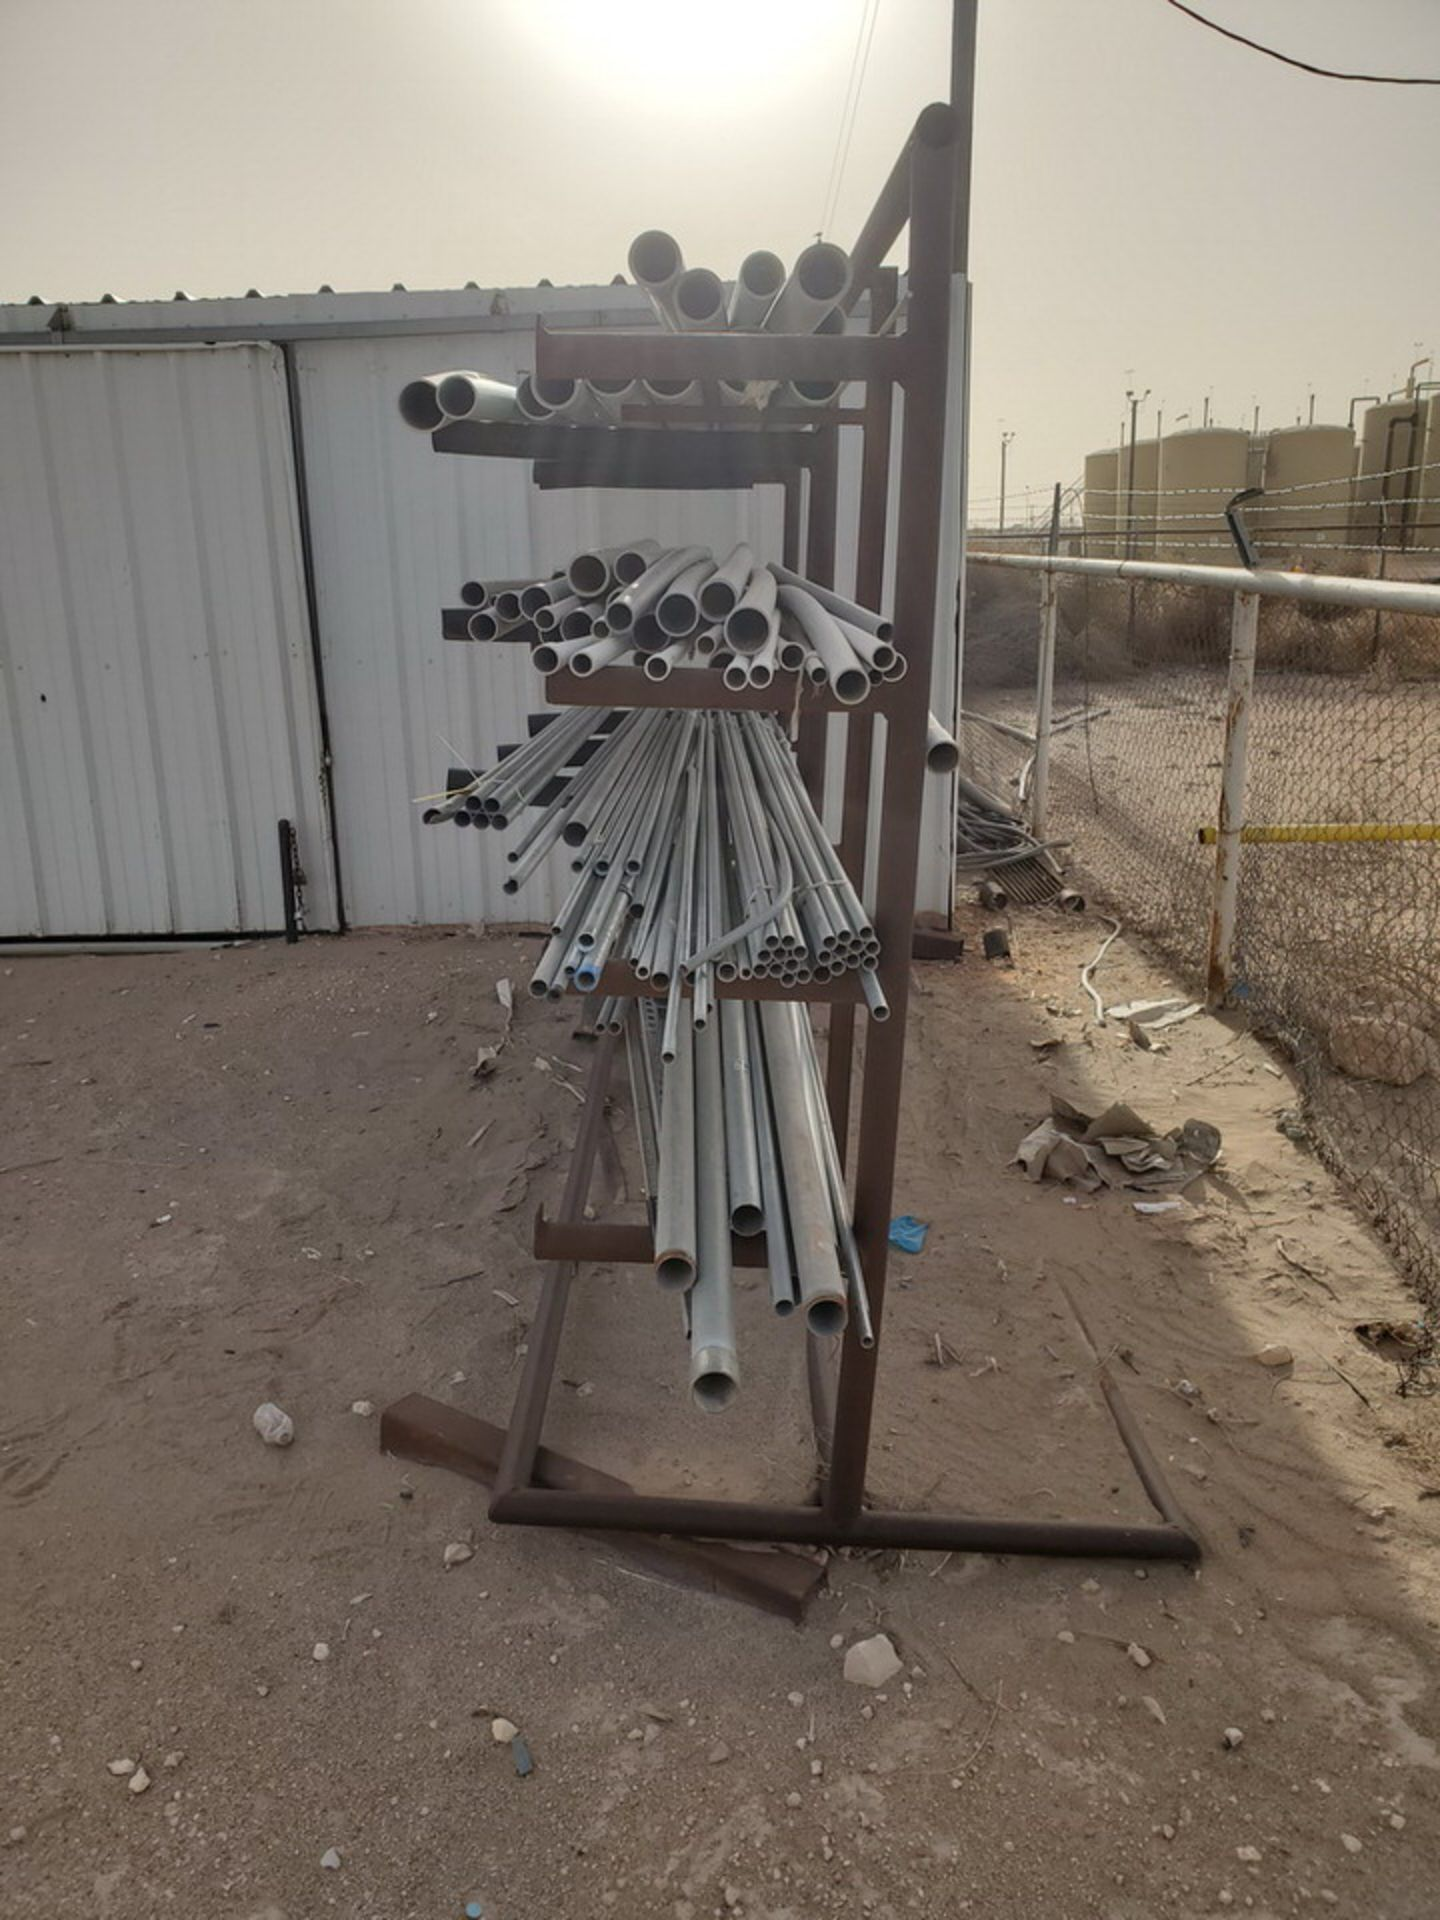 "PVC & Alum. Pipe W/ Conduit Size Range: 1/2"" - 4"" W/ Rack - Image 11 of 18"